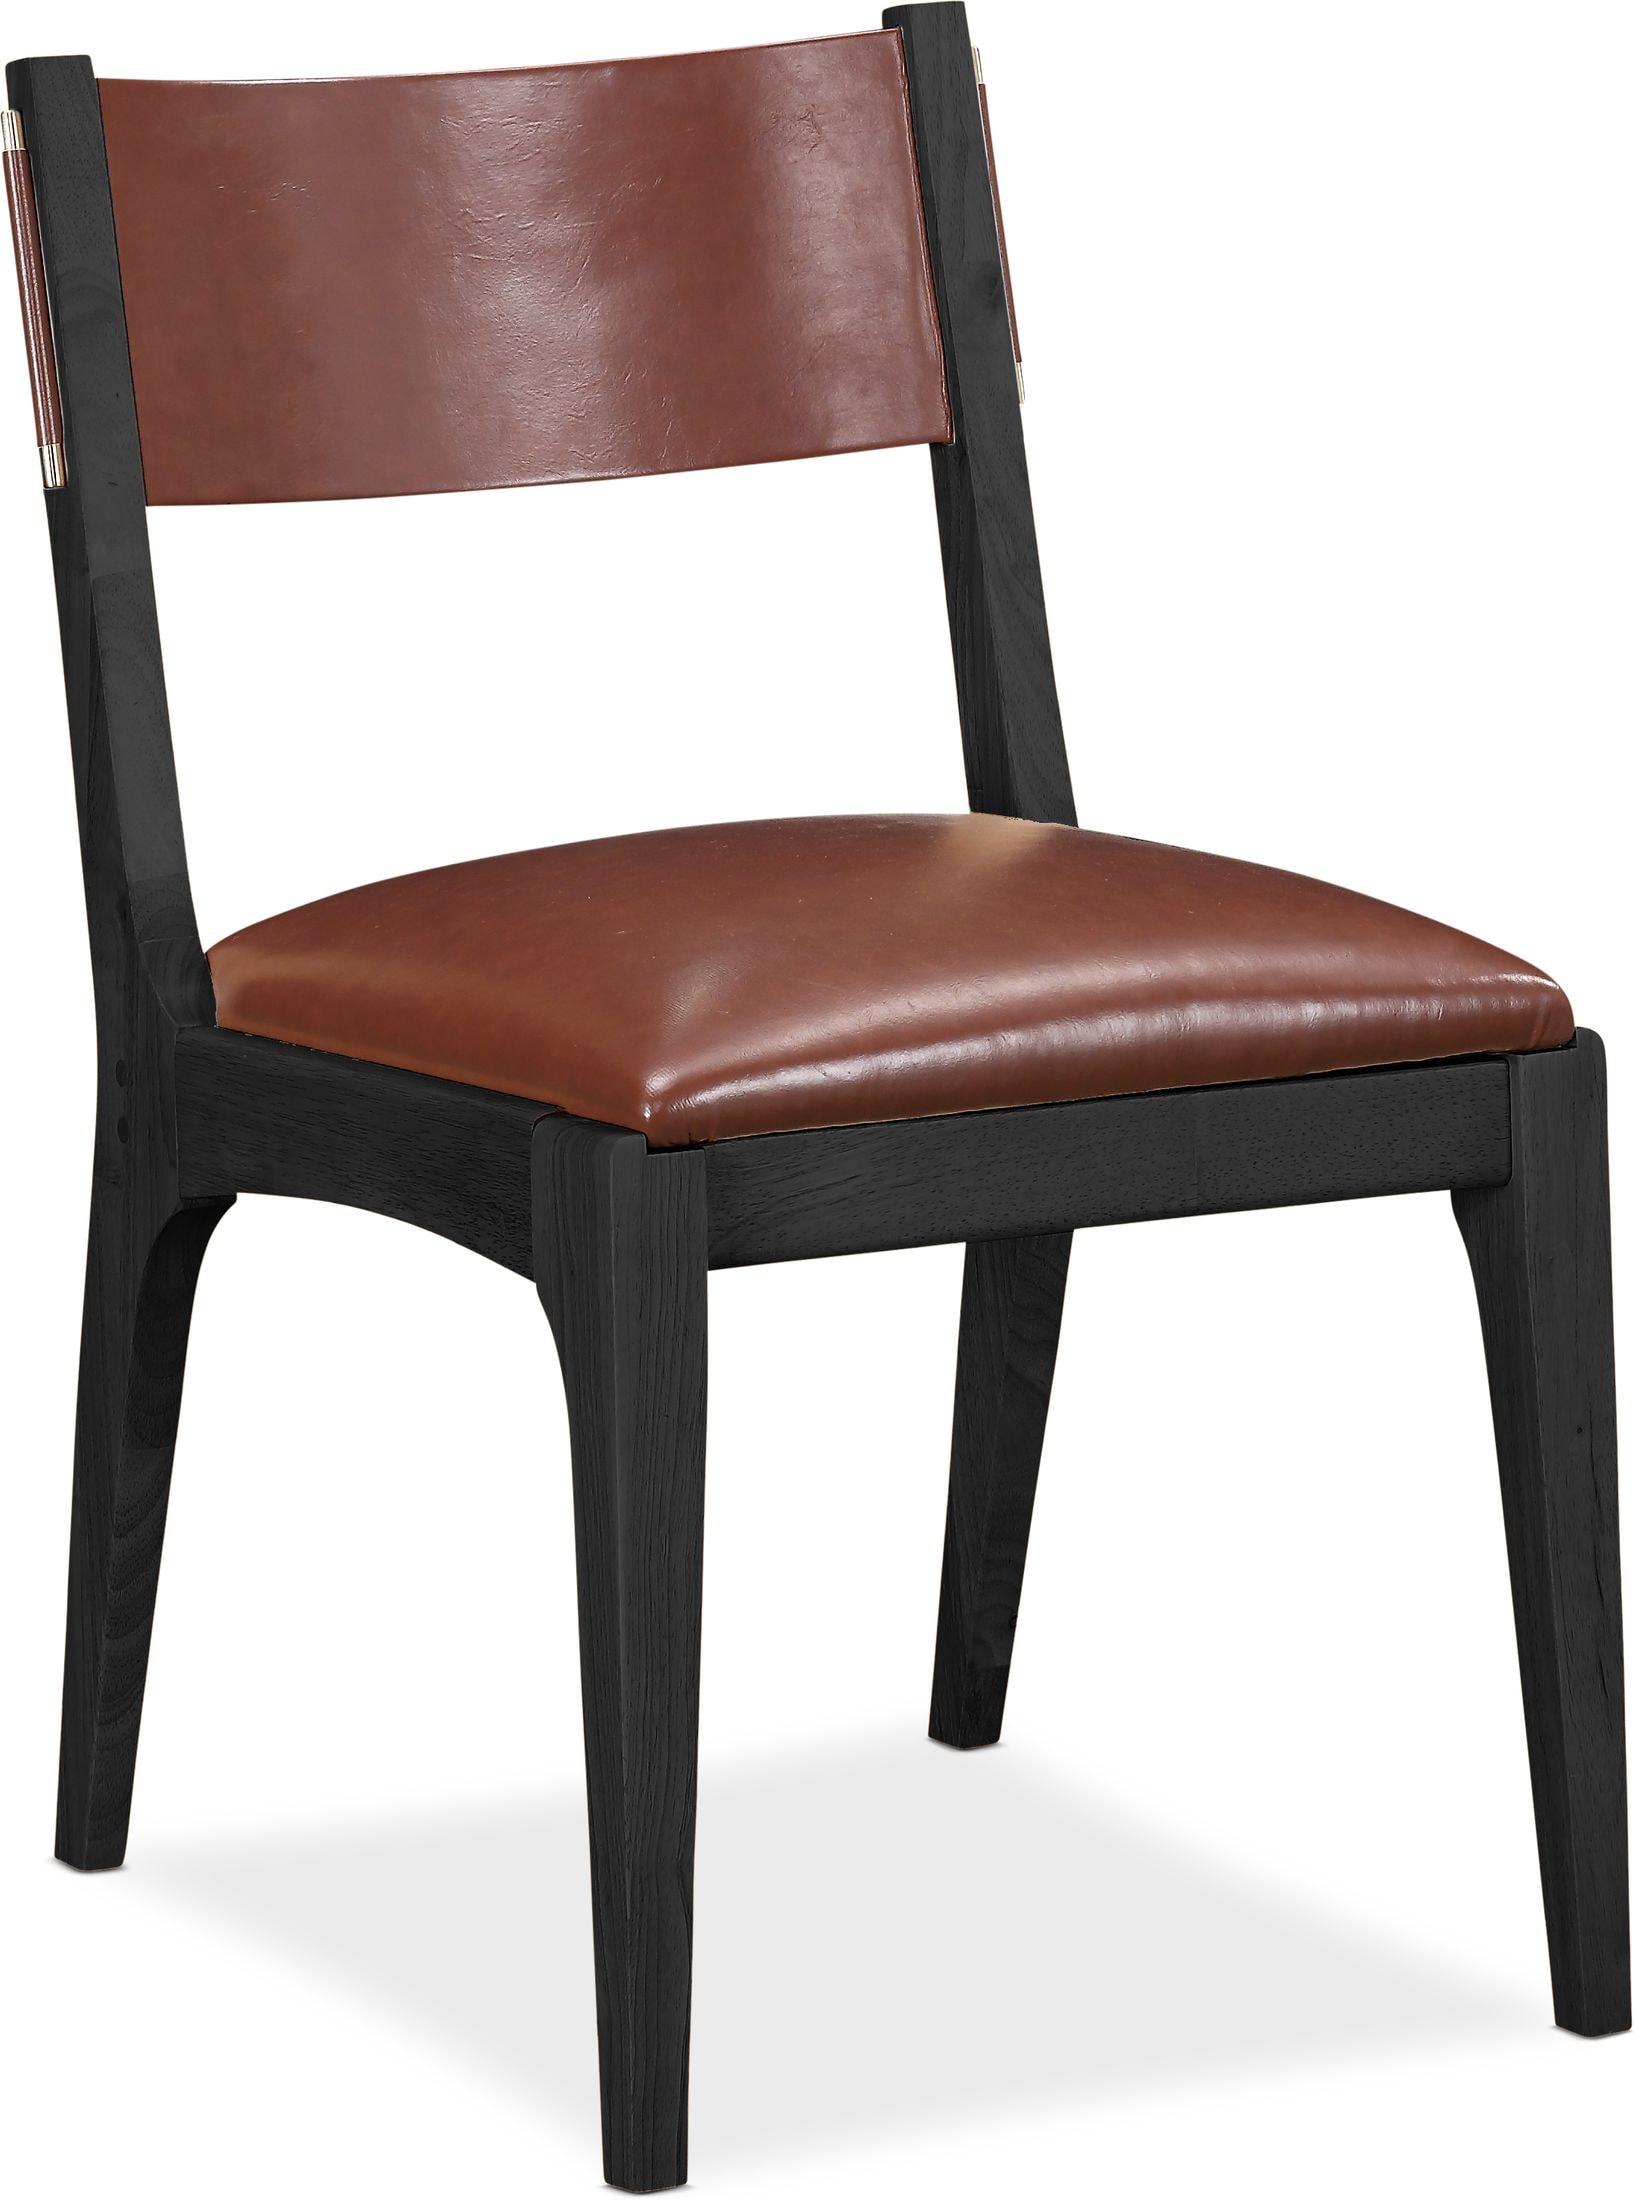 Dining Room Furniture - Bobby Berk Jens Dining Chair